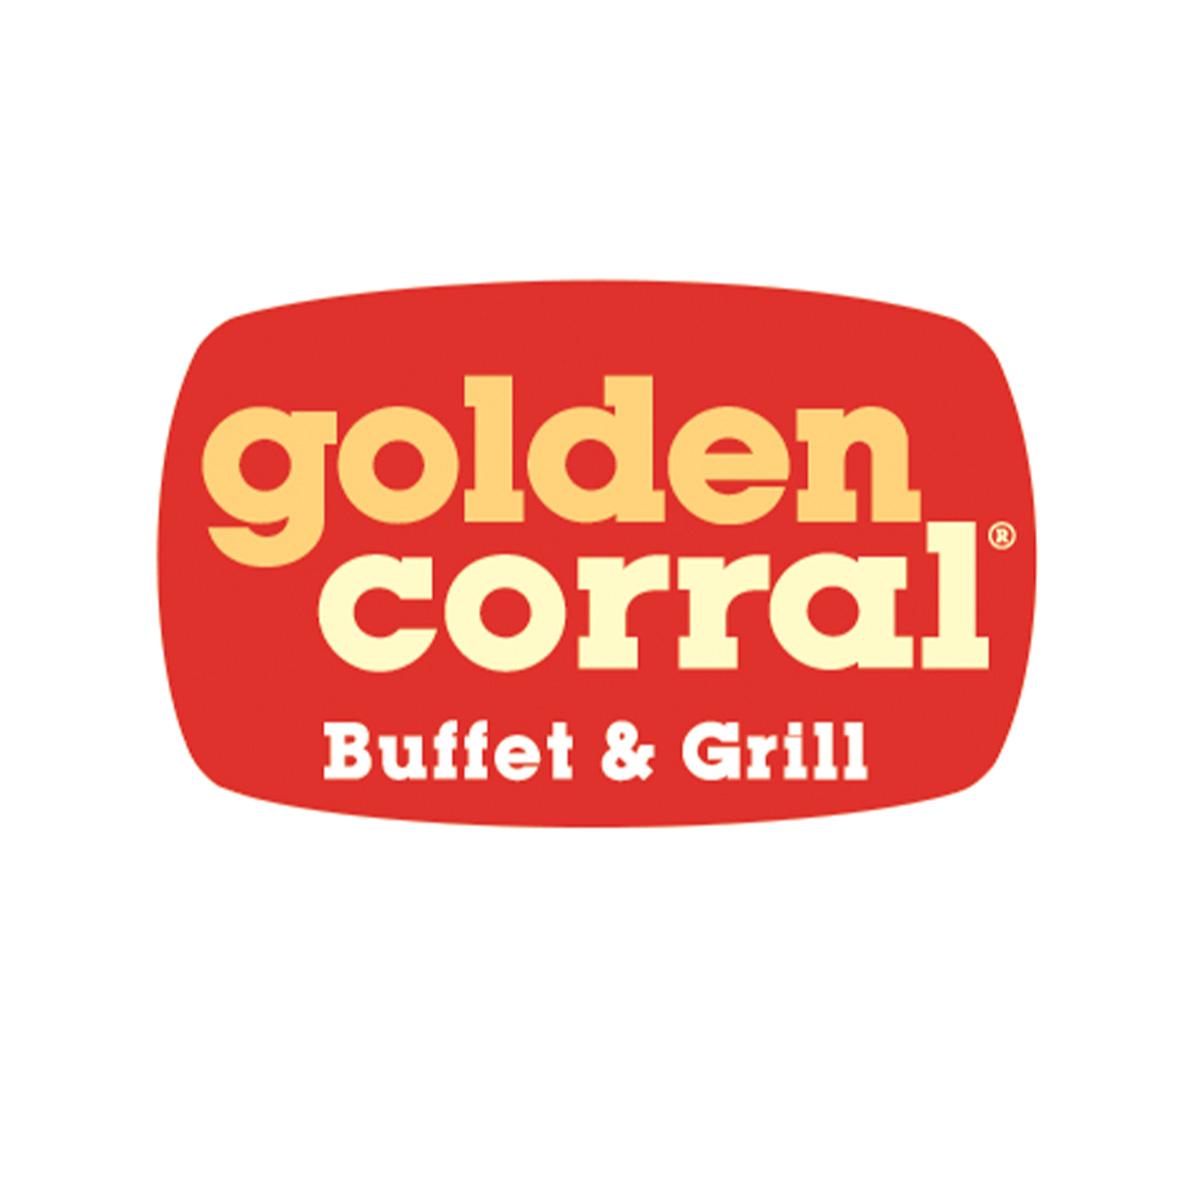 Golden Corral Logo SMCB.jpg